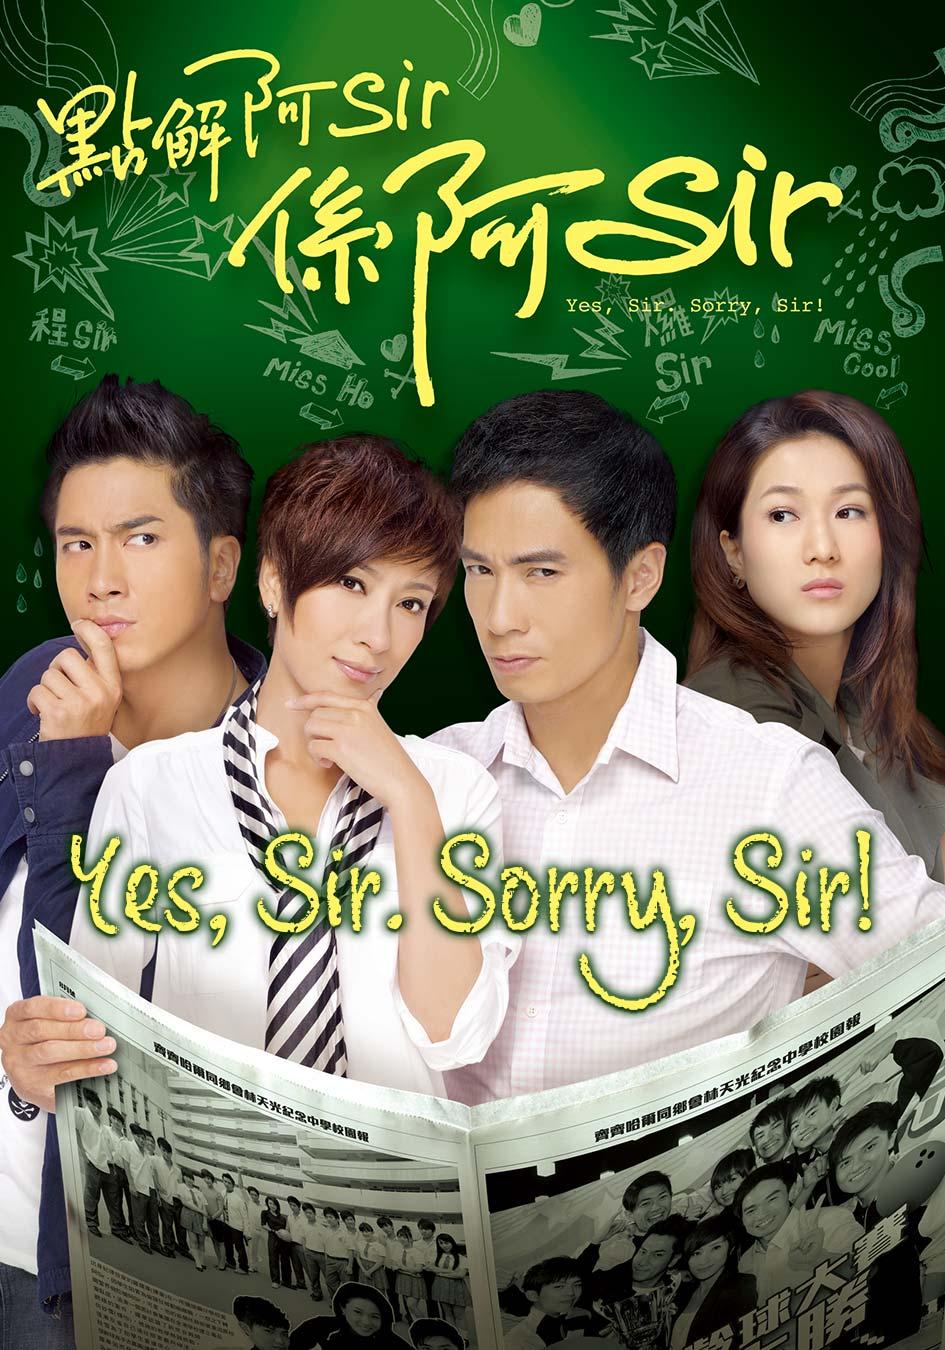 Yes, Sir. Sorry, Sir!-Yes, Sir. Sorry, Sir!